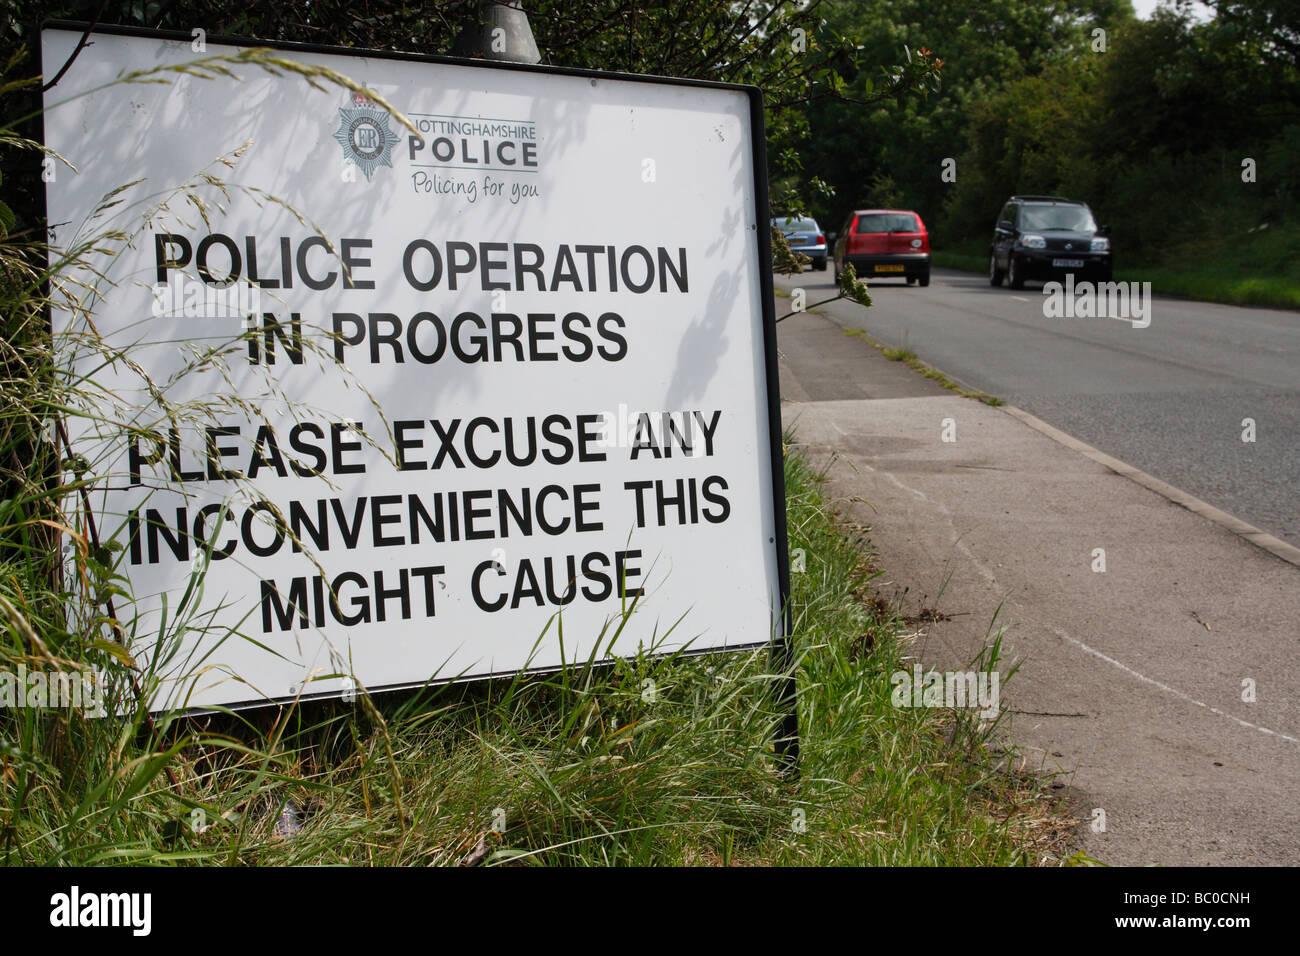 Police Operation In Progress. A Nottinghamshire Police roadside sign. - Stock Image